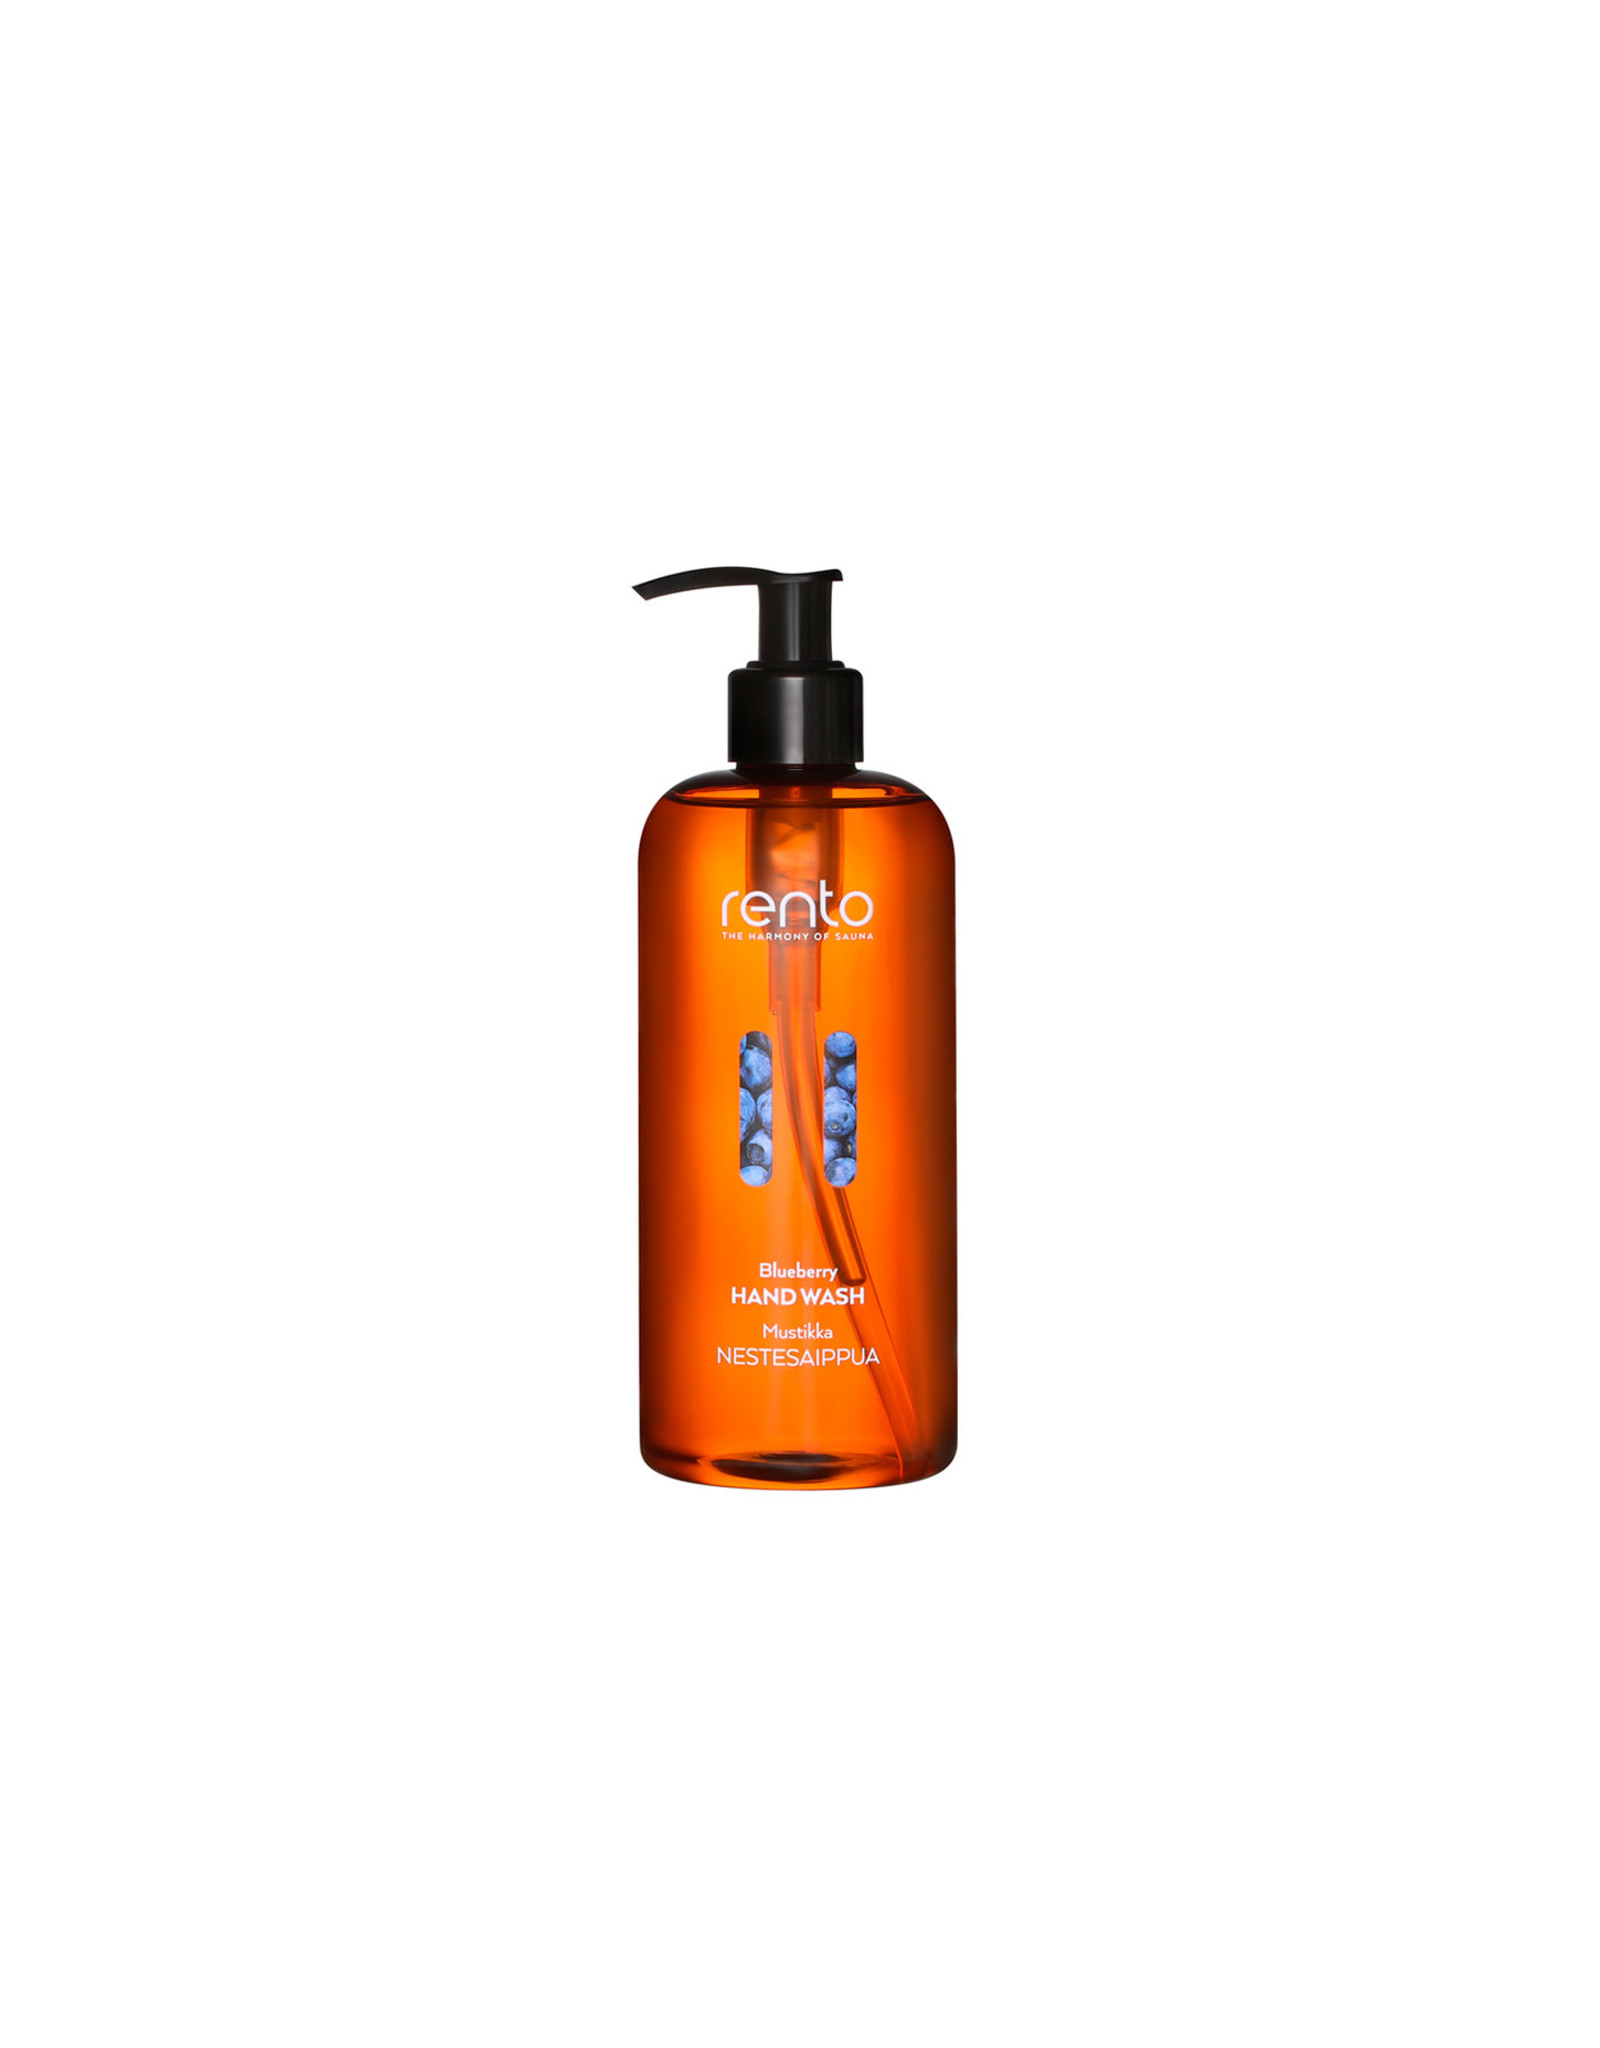 Rento Rento Hand Soap